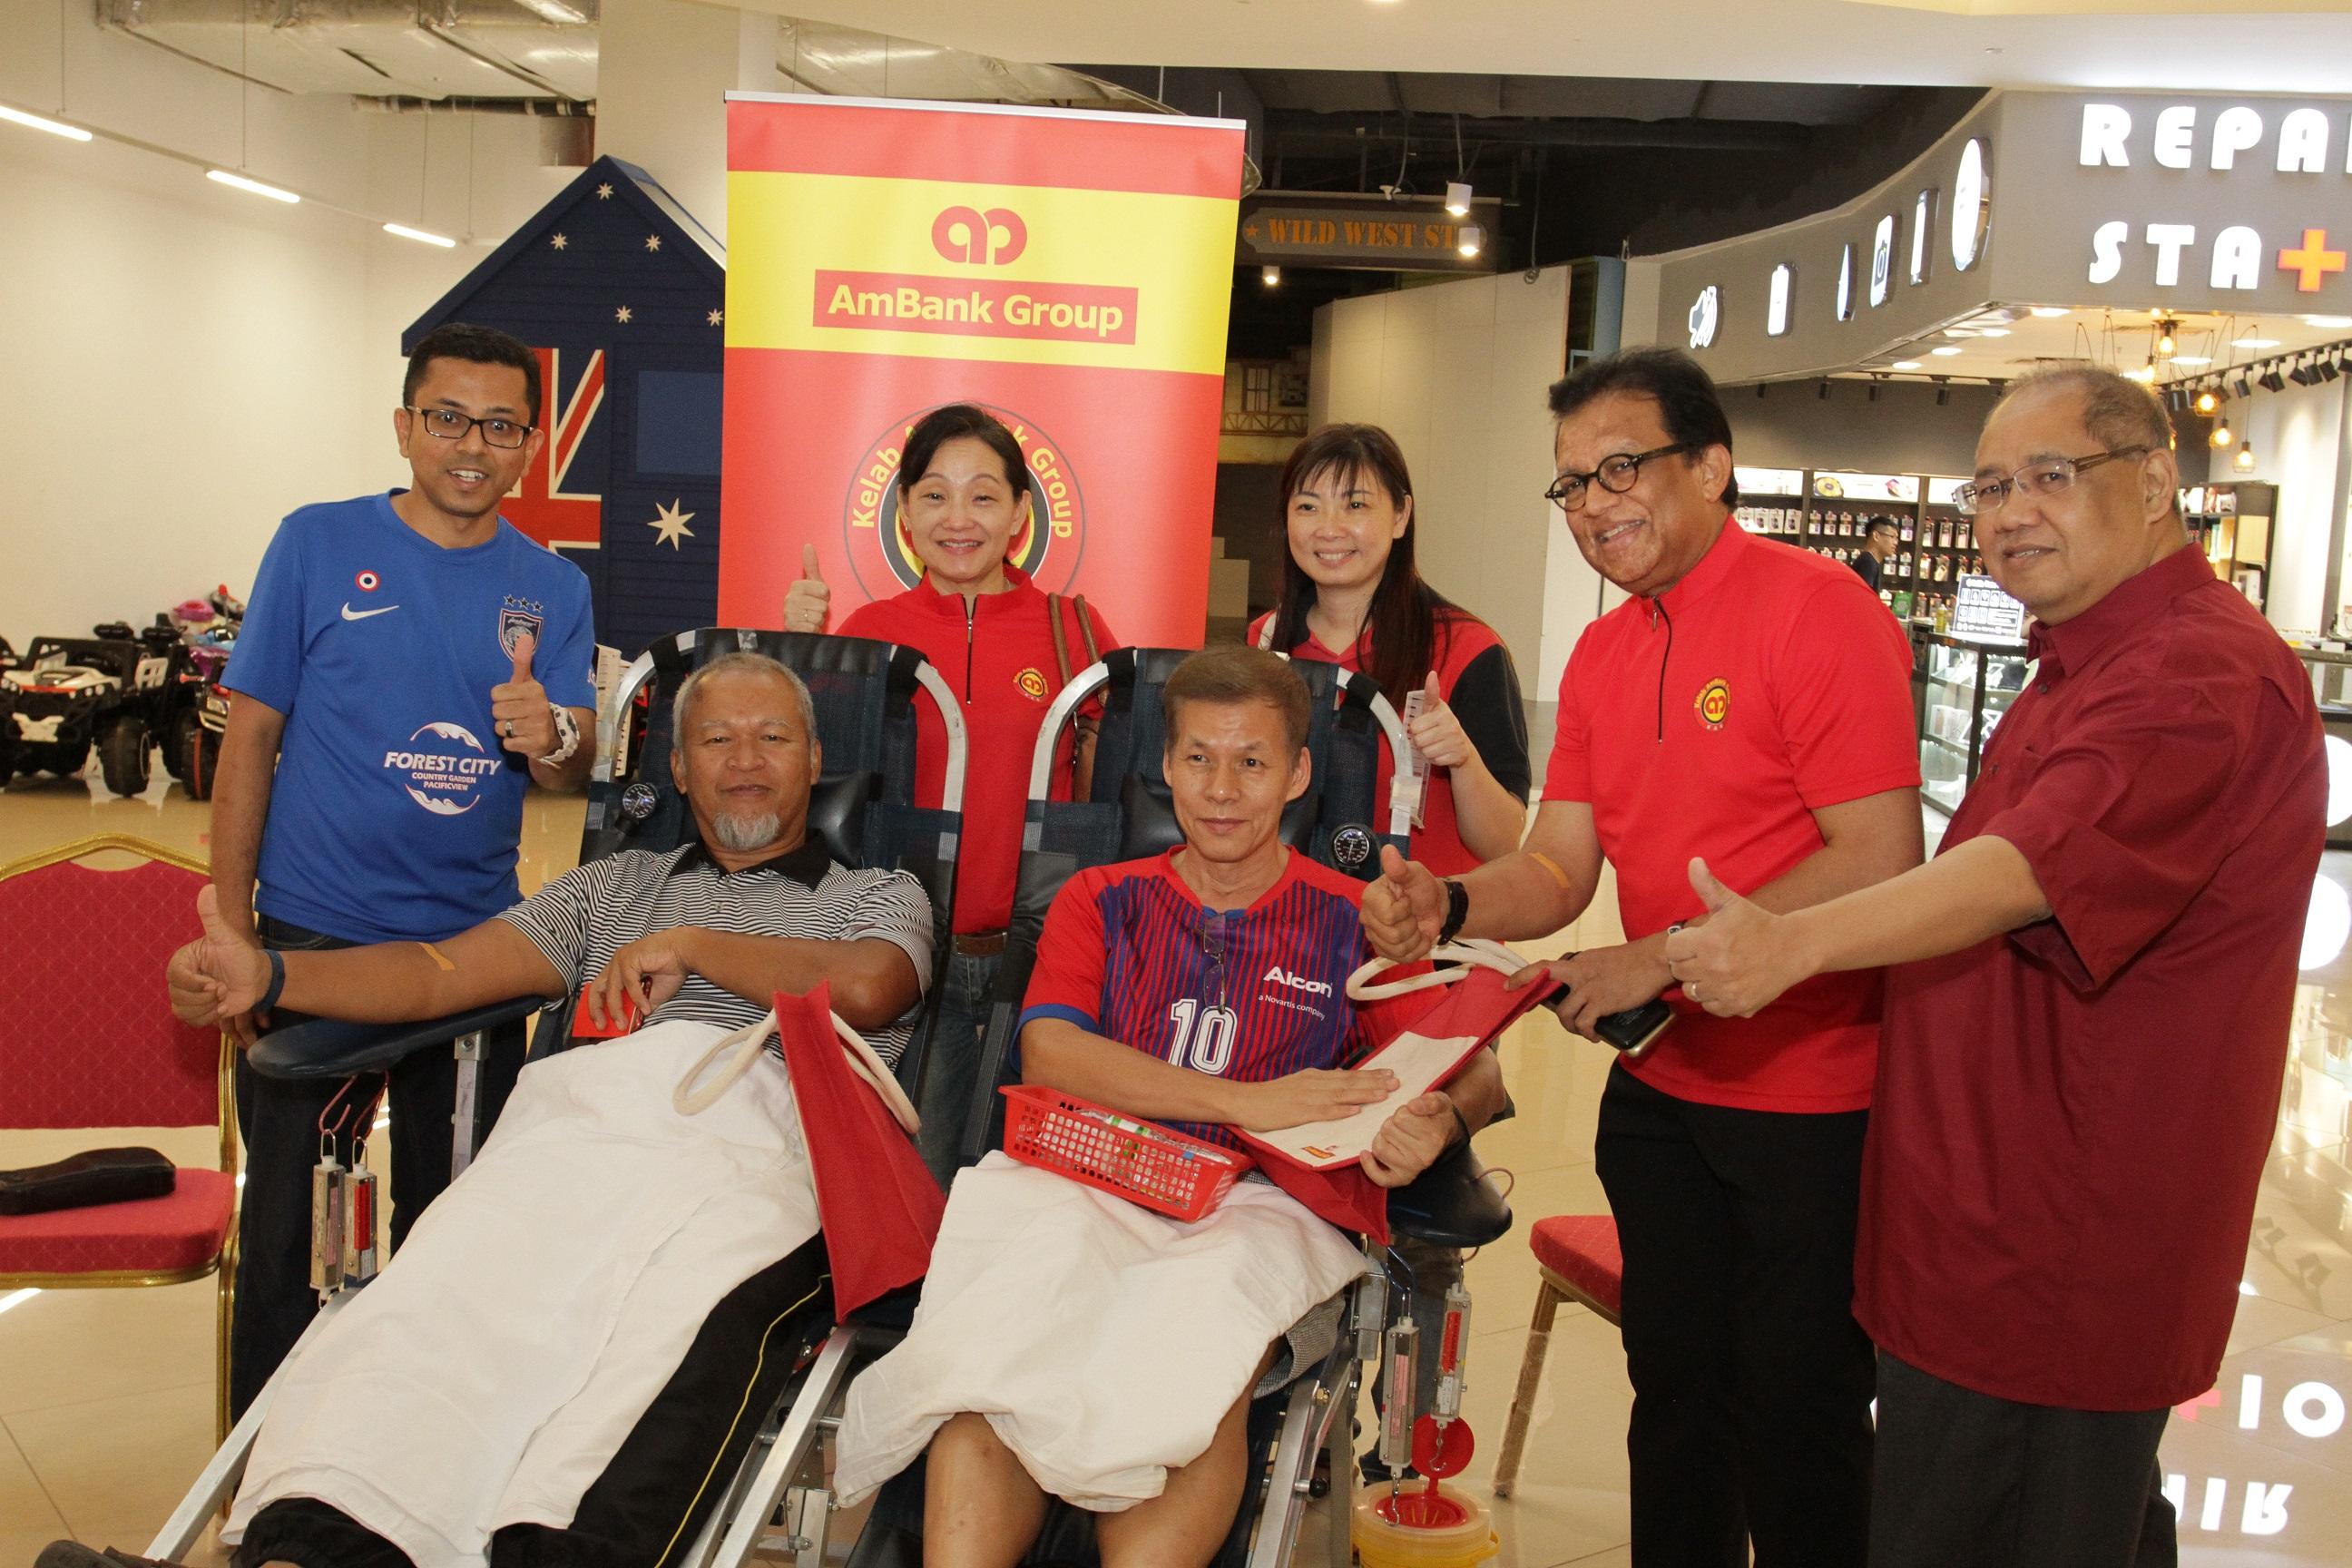 Kelab AmBank Group Blood Donation Drive 2019 in Johor